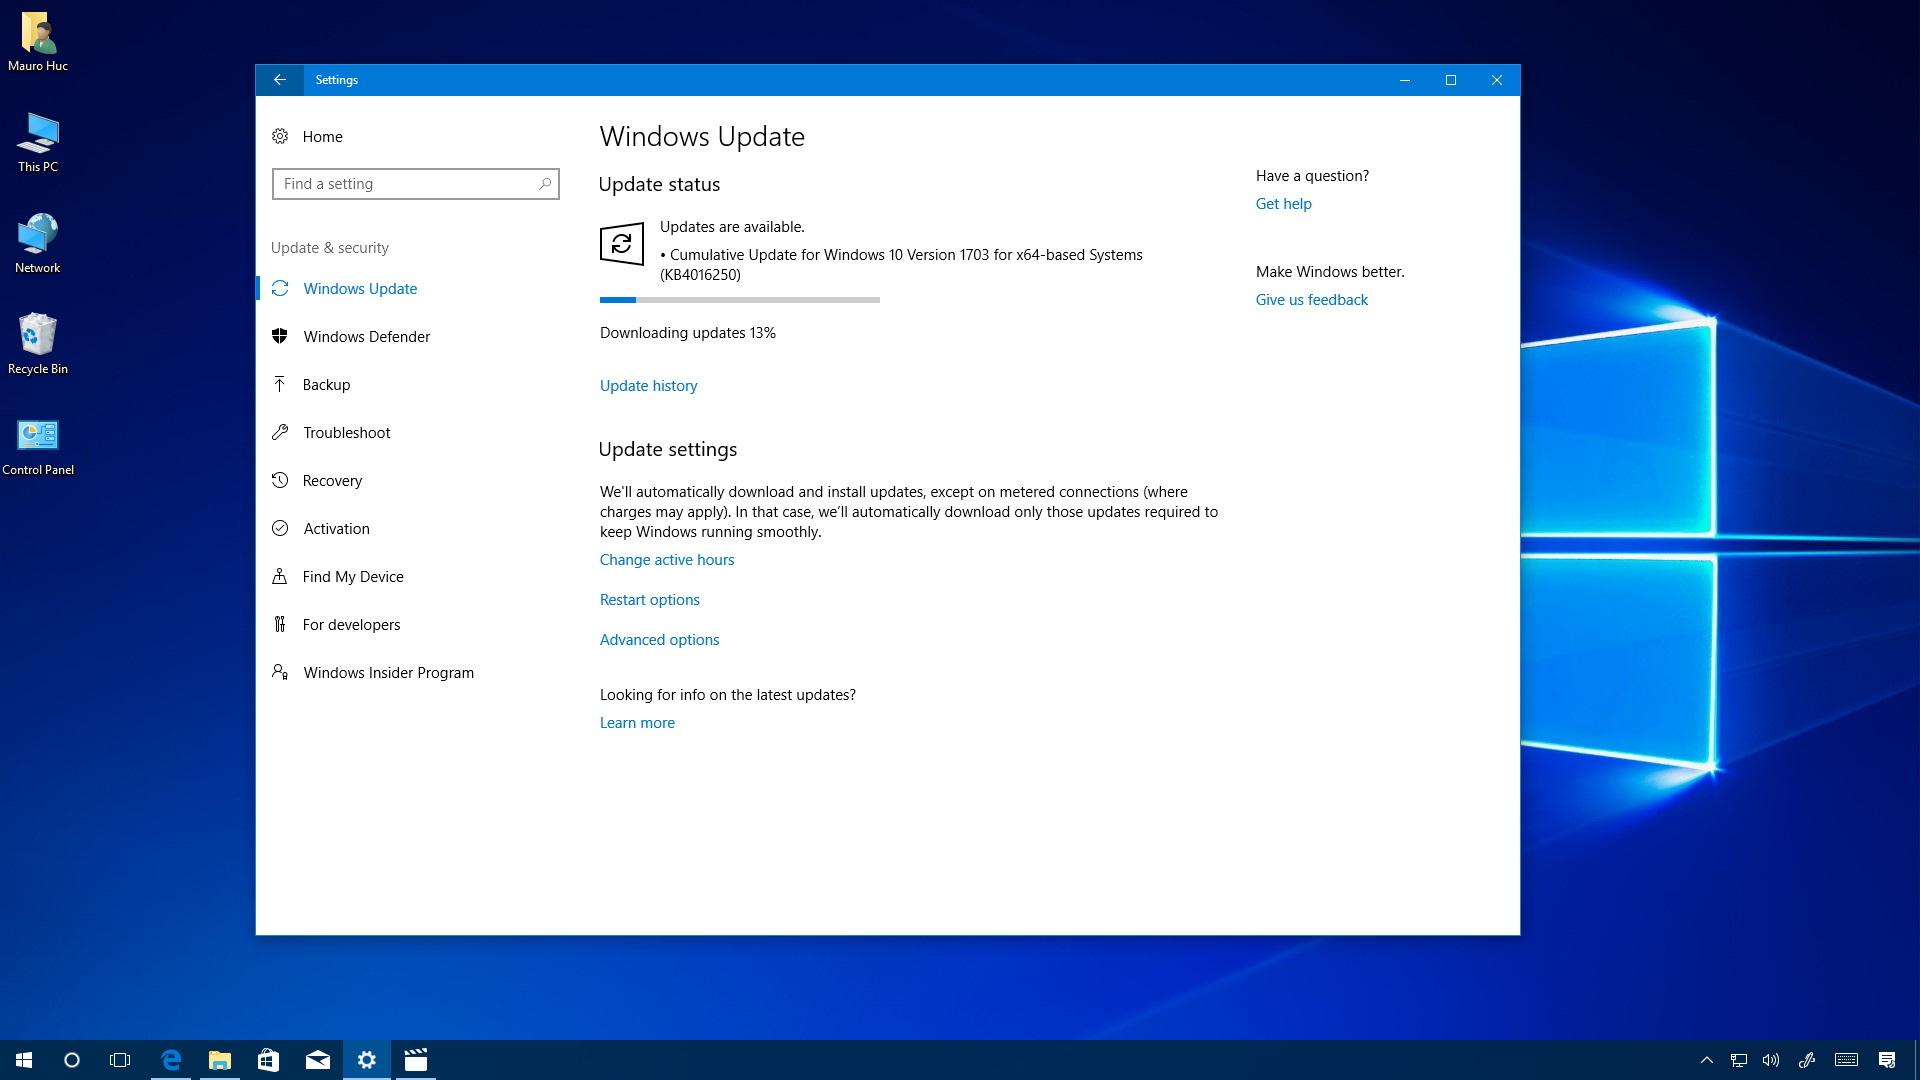 New Fall Creator Wallpaper Cumulative Update Kb4016250 Releases For Windows 10